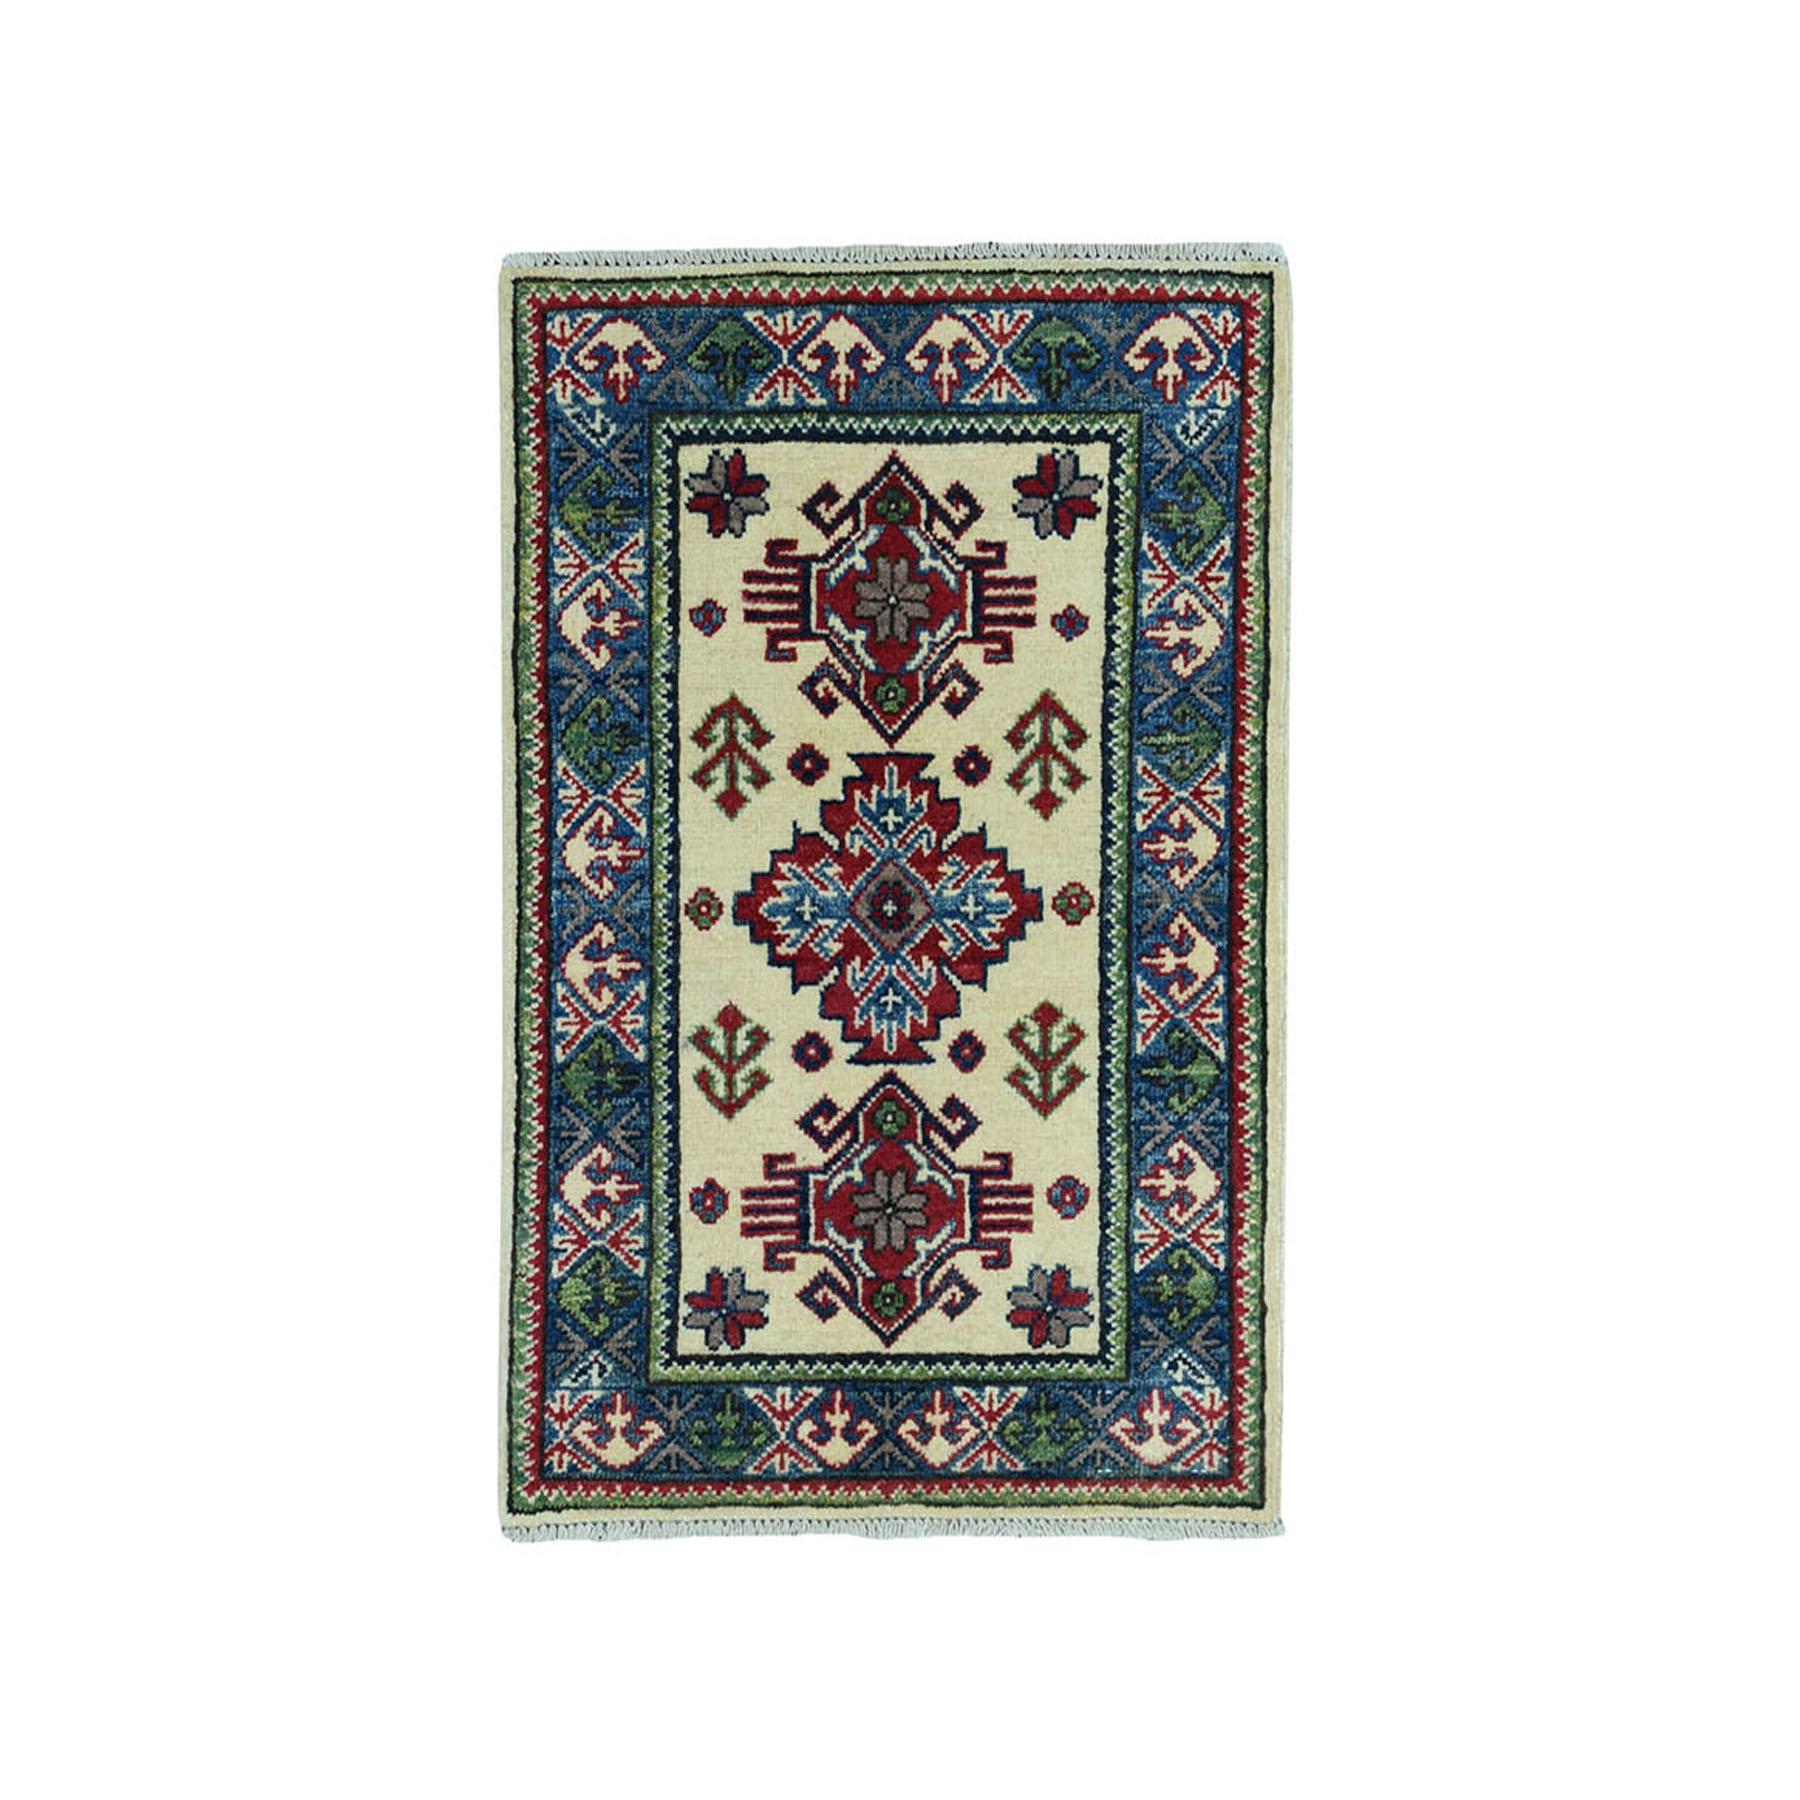 2'X3' Ivory Geometric Design Kazak Pure Wool Hand-Knotted Oriental Rug moae08d7